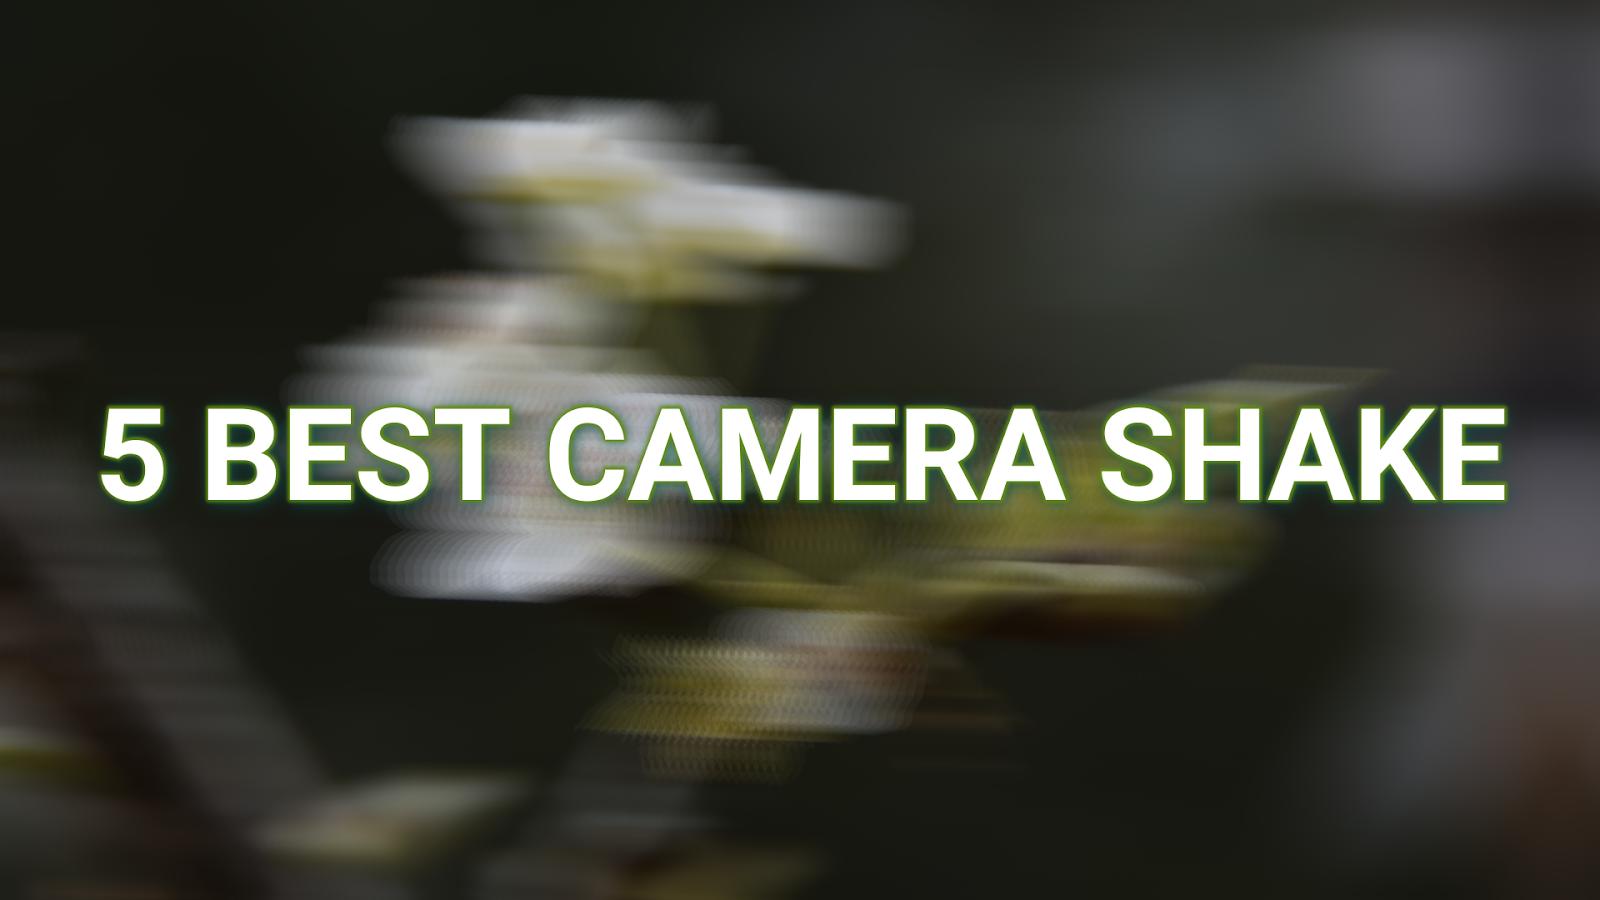 filmora camera shake effects